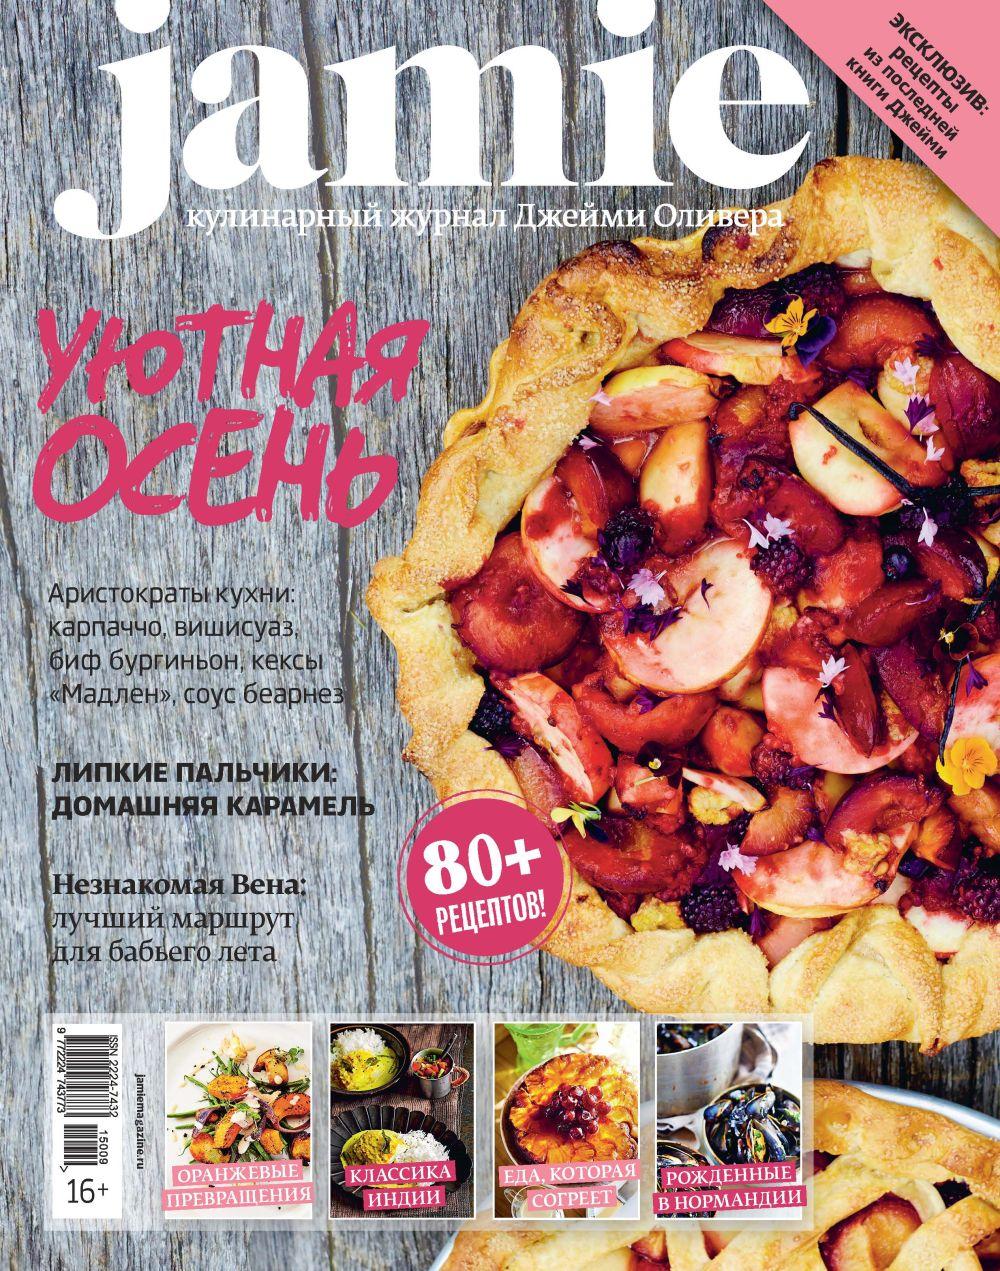 Журнал Jamie Magazine № 9 сентябрь 2015 г. от book24.ru